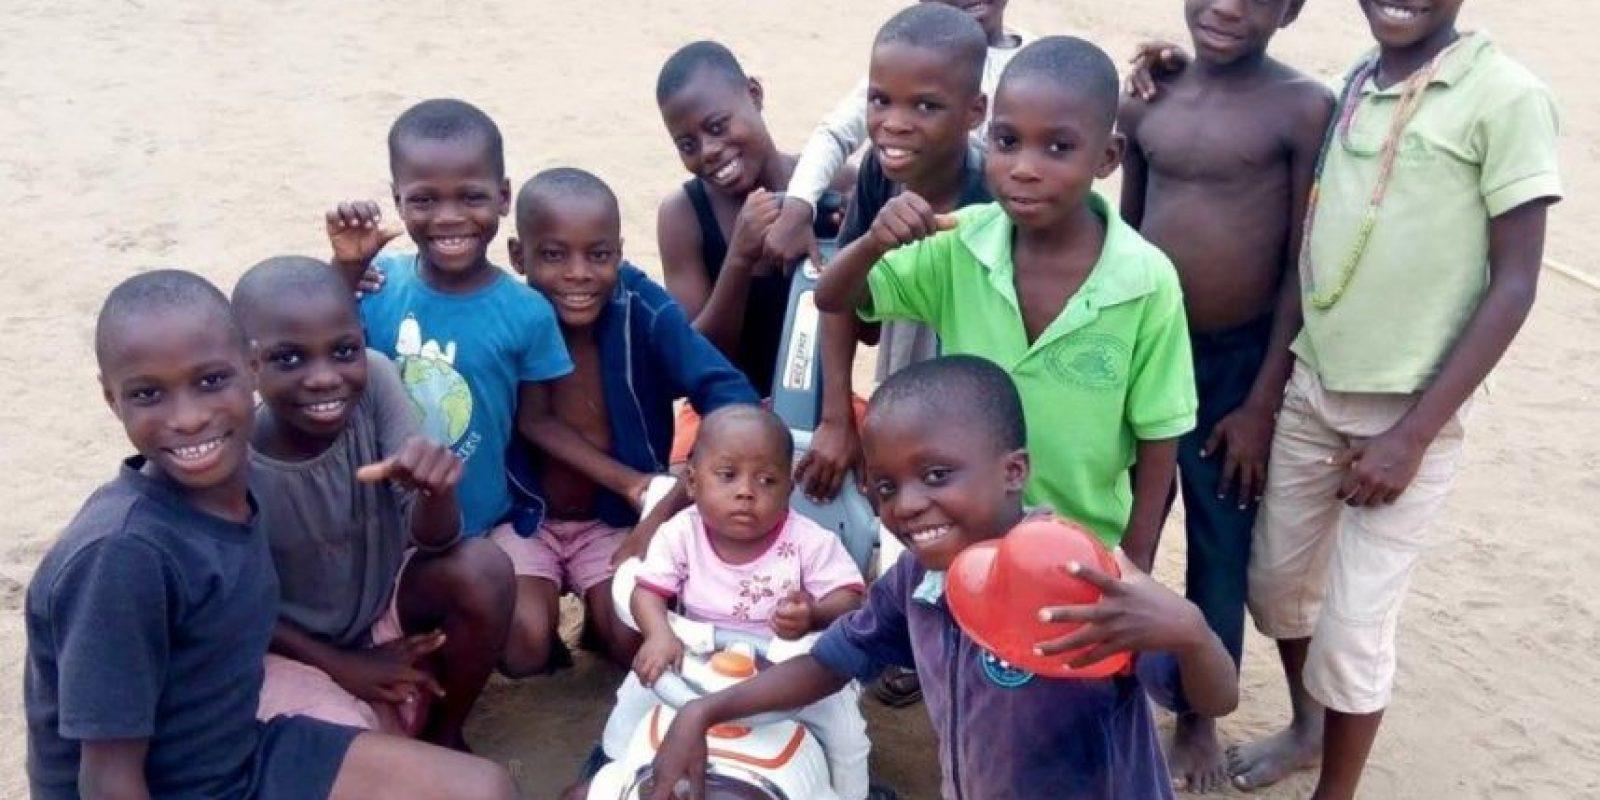 Anja Ringgren fundó African Children's Aid Education and Development Foundation el 21 de de mayo de 2014 Foto:facebook.com/anja.loven/